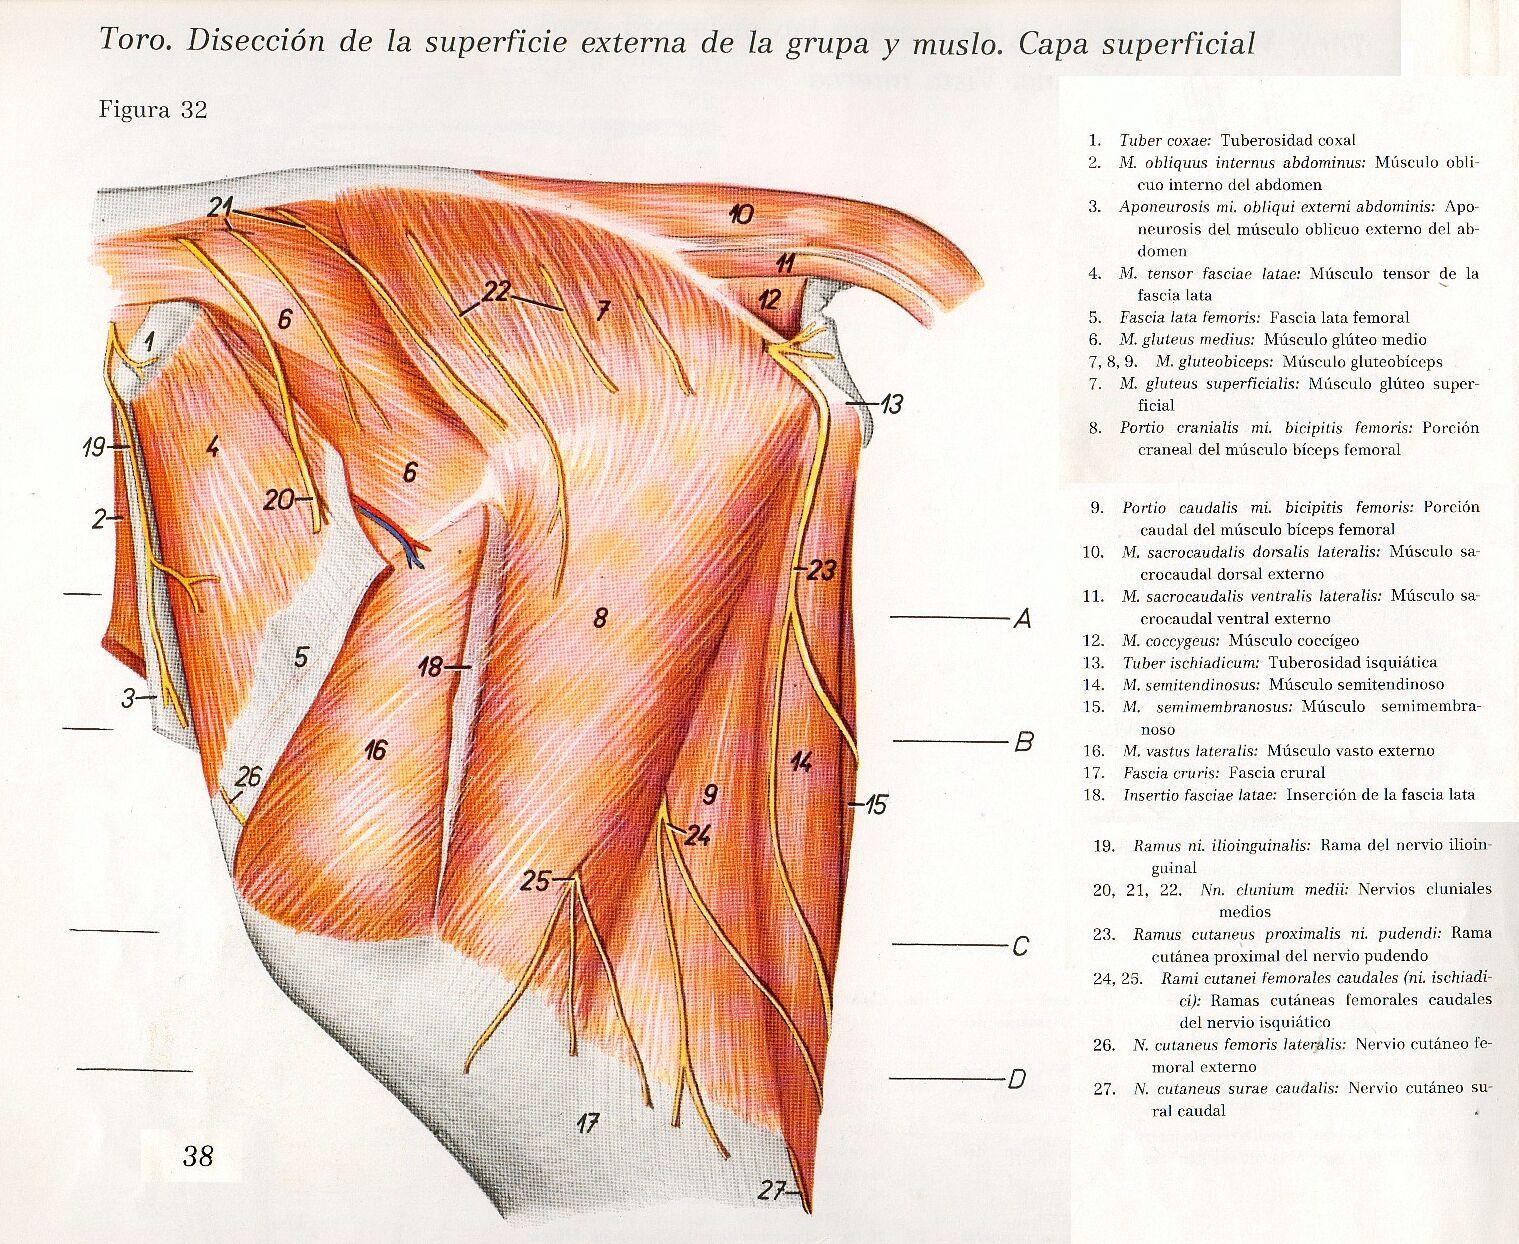 Anatomia Veterinaria: Miembro Pelviano (Toro) | jajaj | Pinterest ...